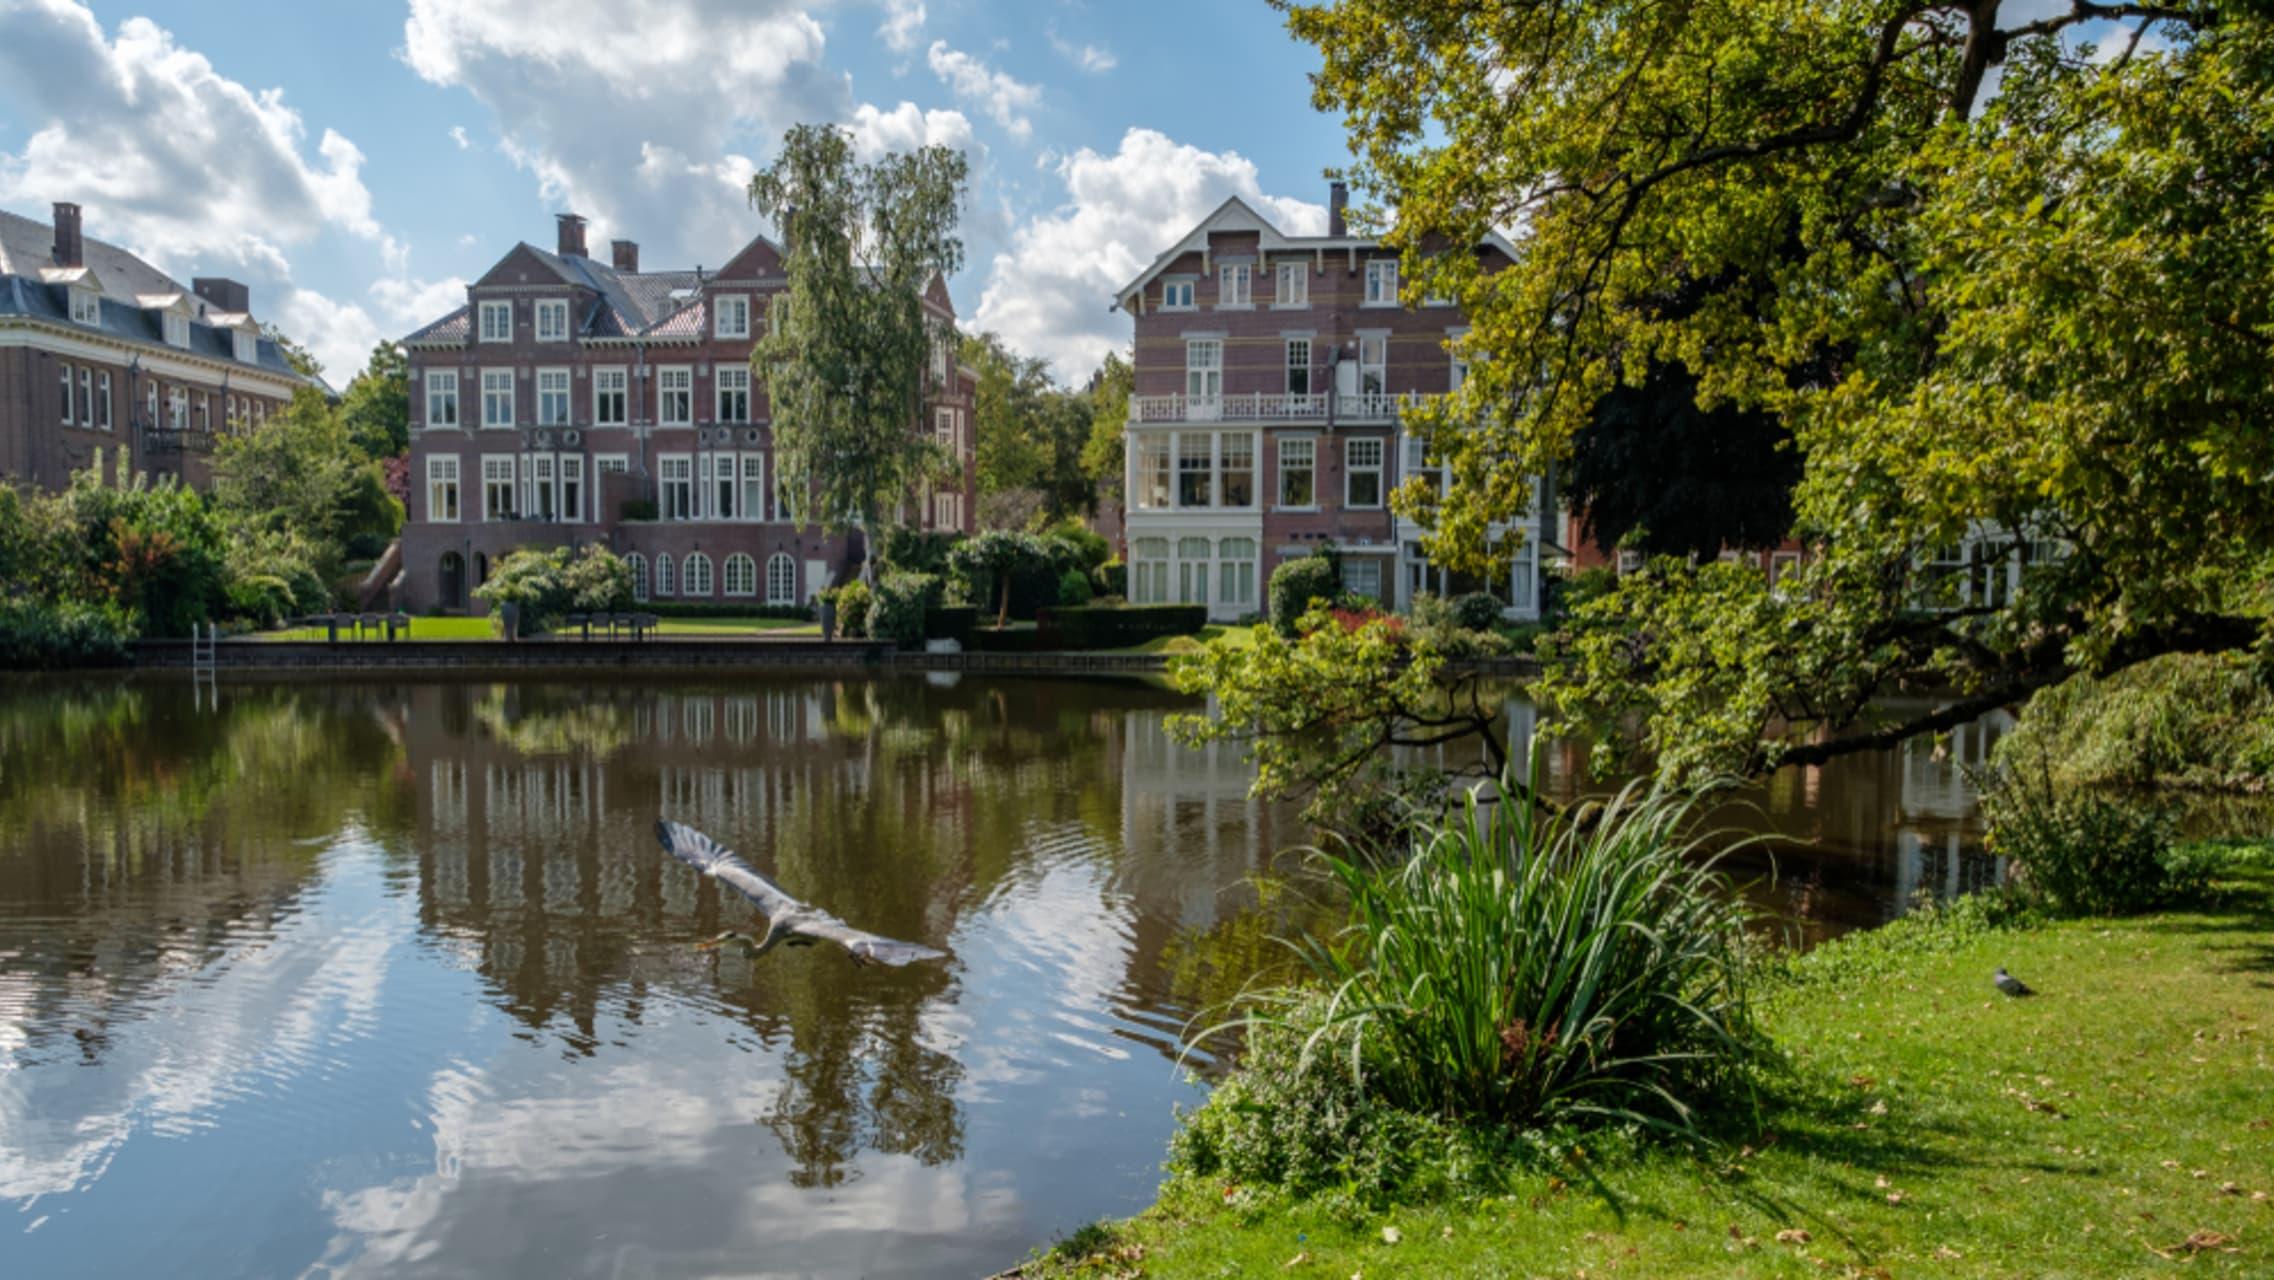 Amsterdam - Leidseplein and Vondelpark: Freedom and Culture